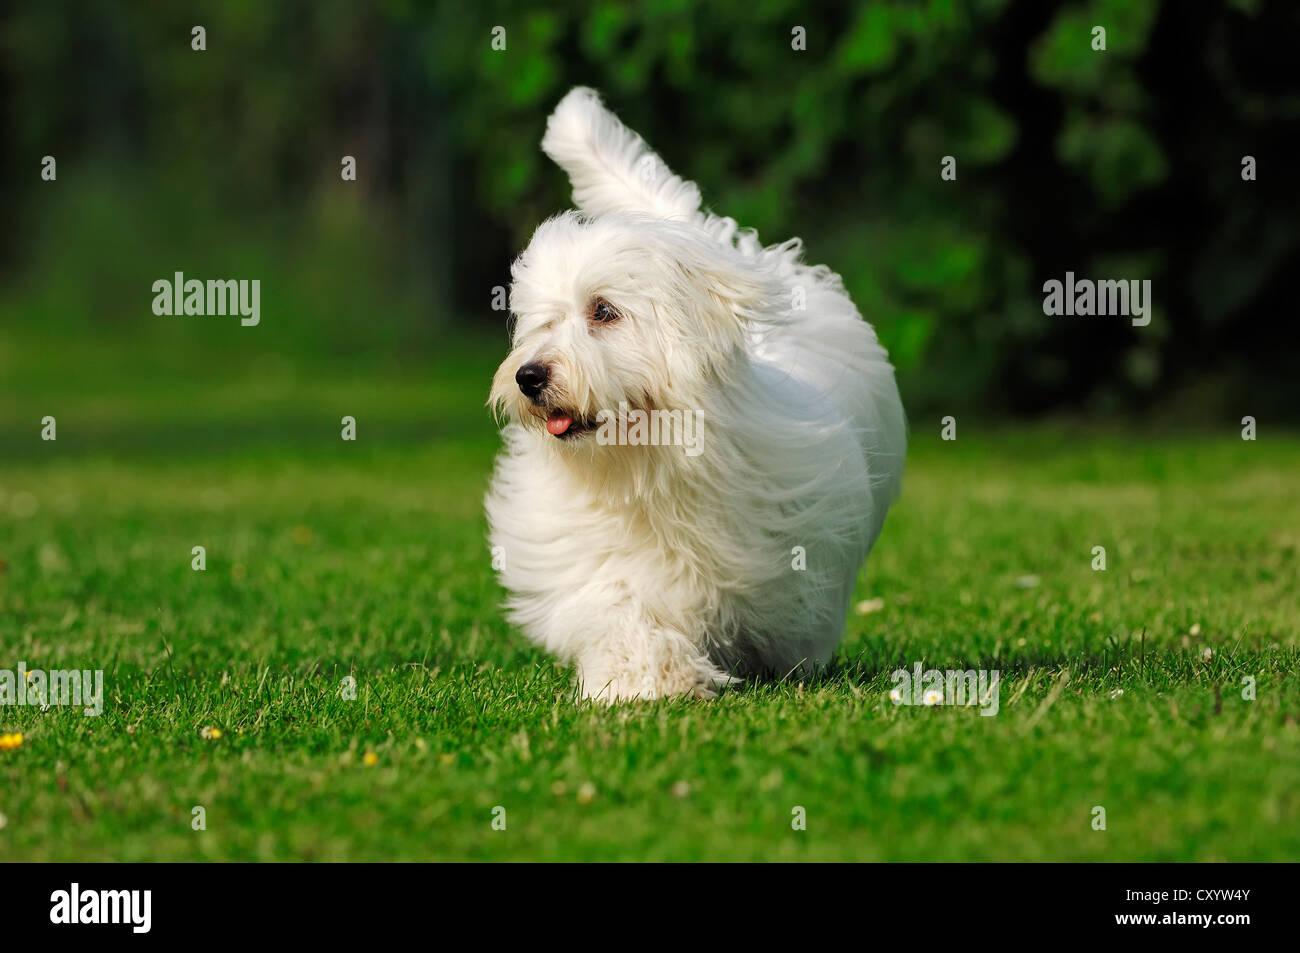 Coton de Tulear, dog (Canis lupus familiaris) Stock Photo